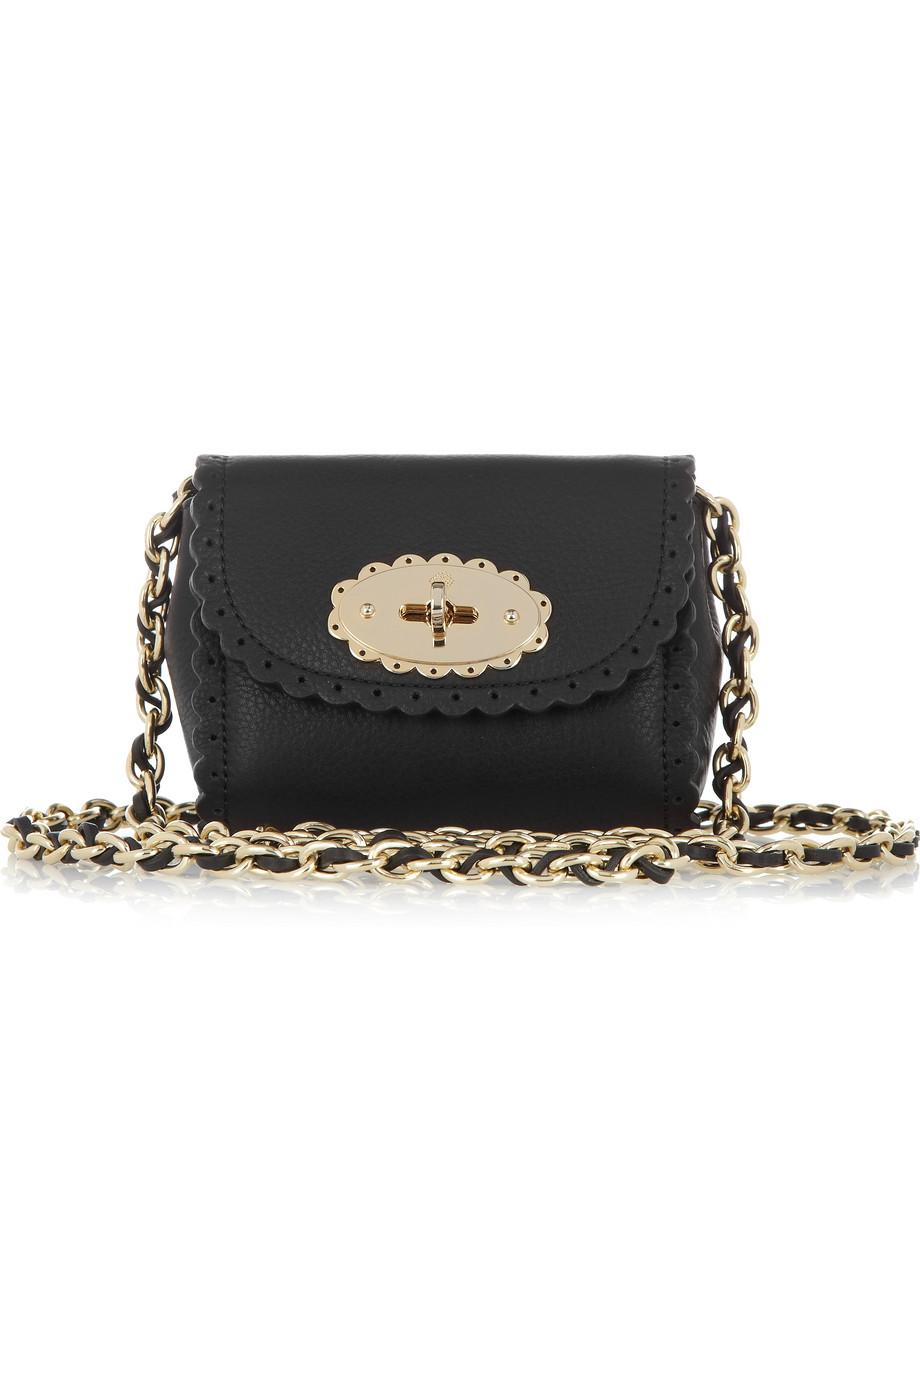 2e25e3fbc96b ... promo code for mulberry cookie mini leather bag in black lyst e91c1  6d351